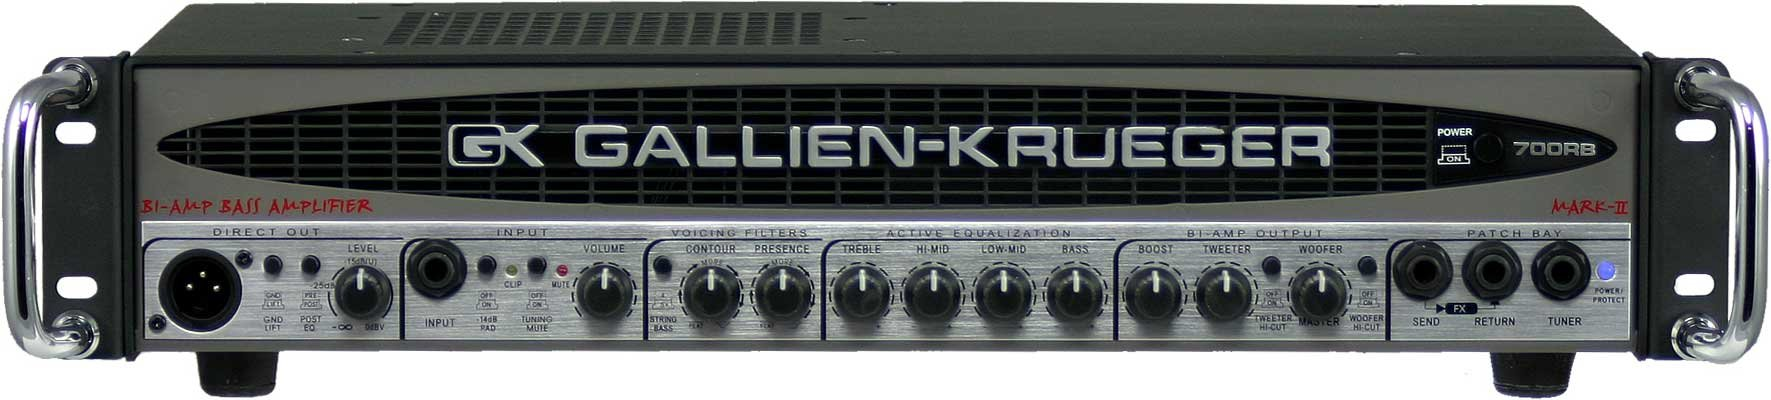 480W Bass Amplifier Head with 50W Horn Bi-Amp System